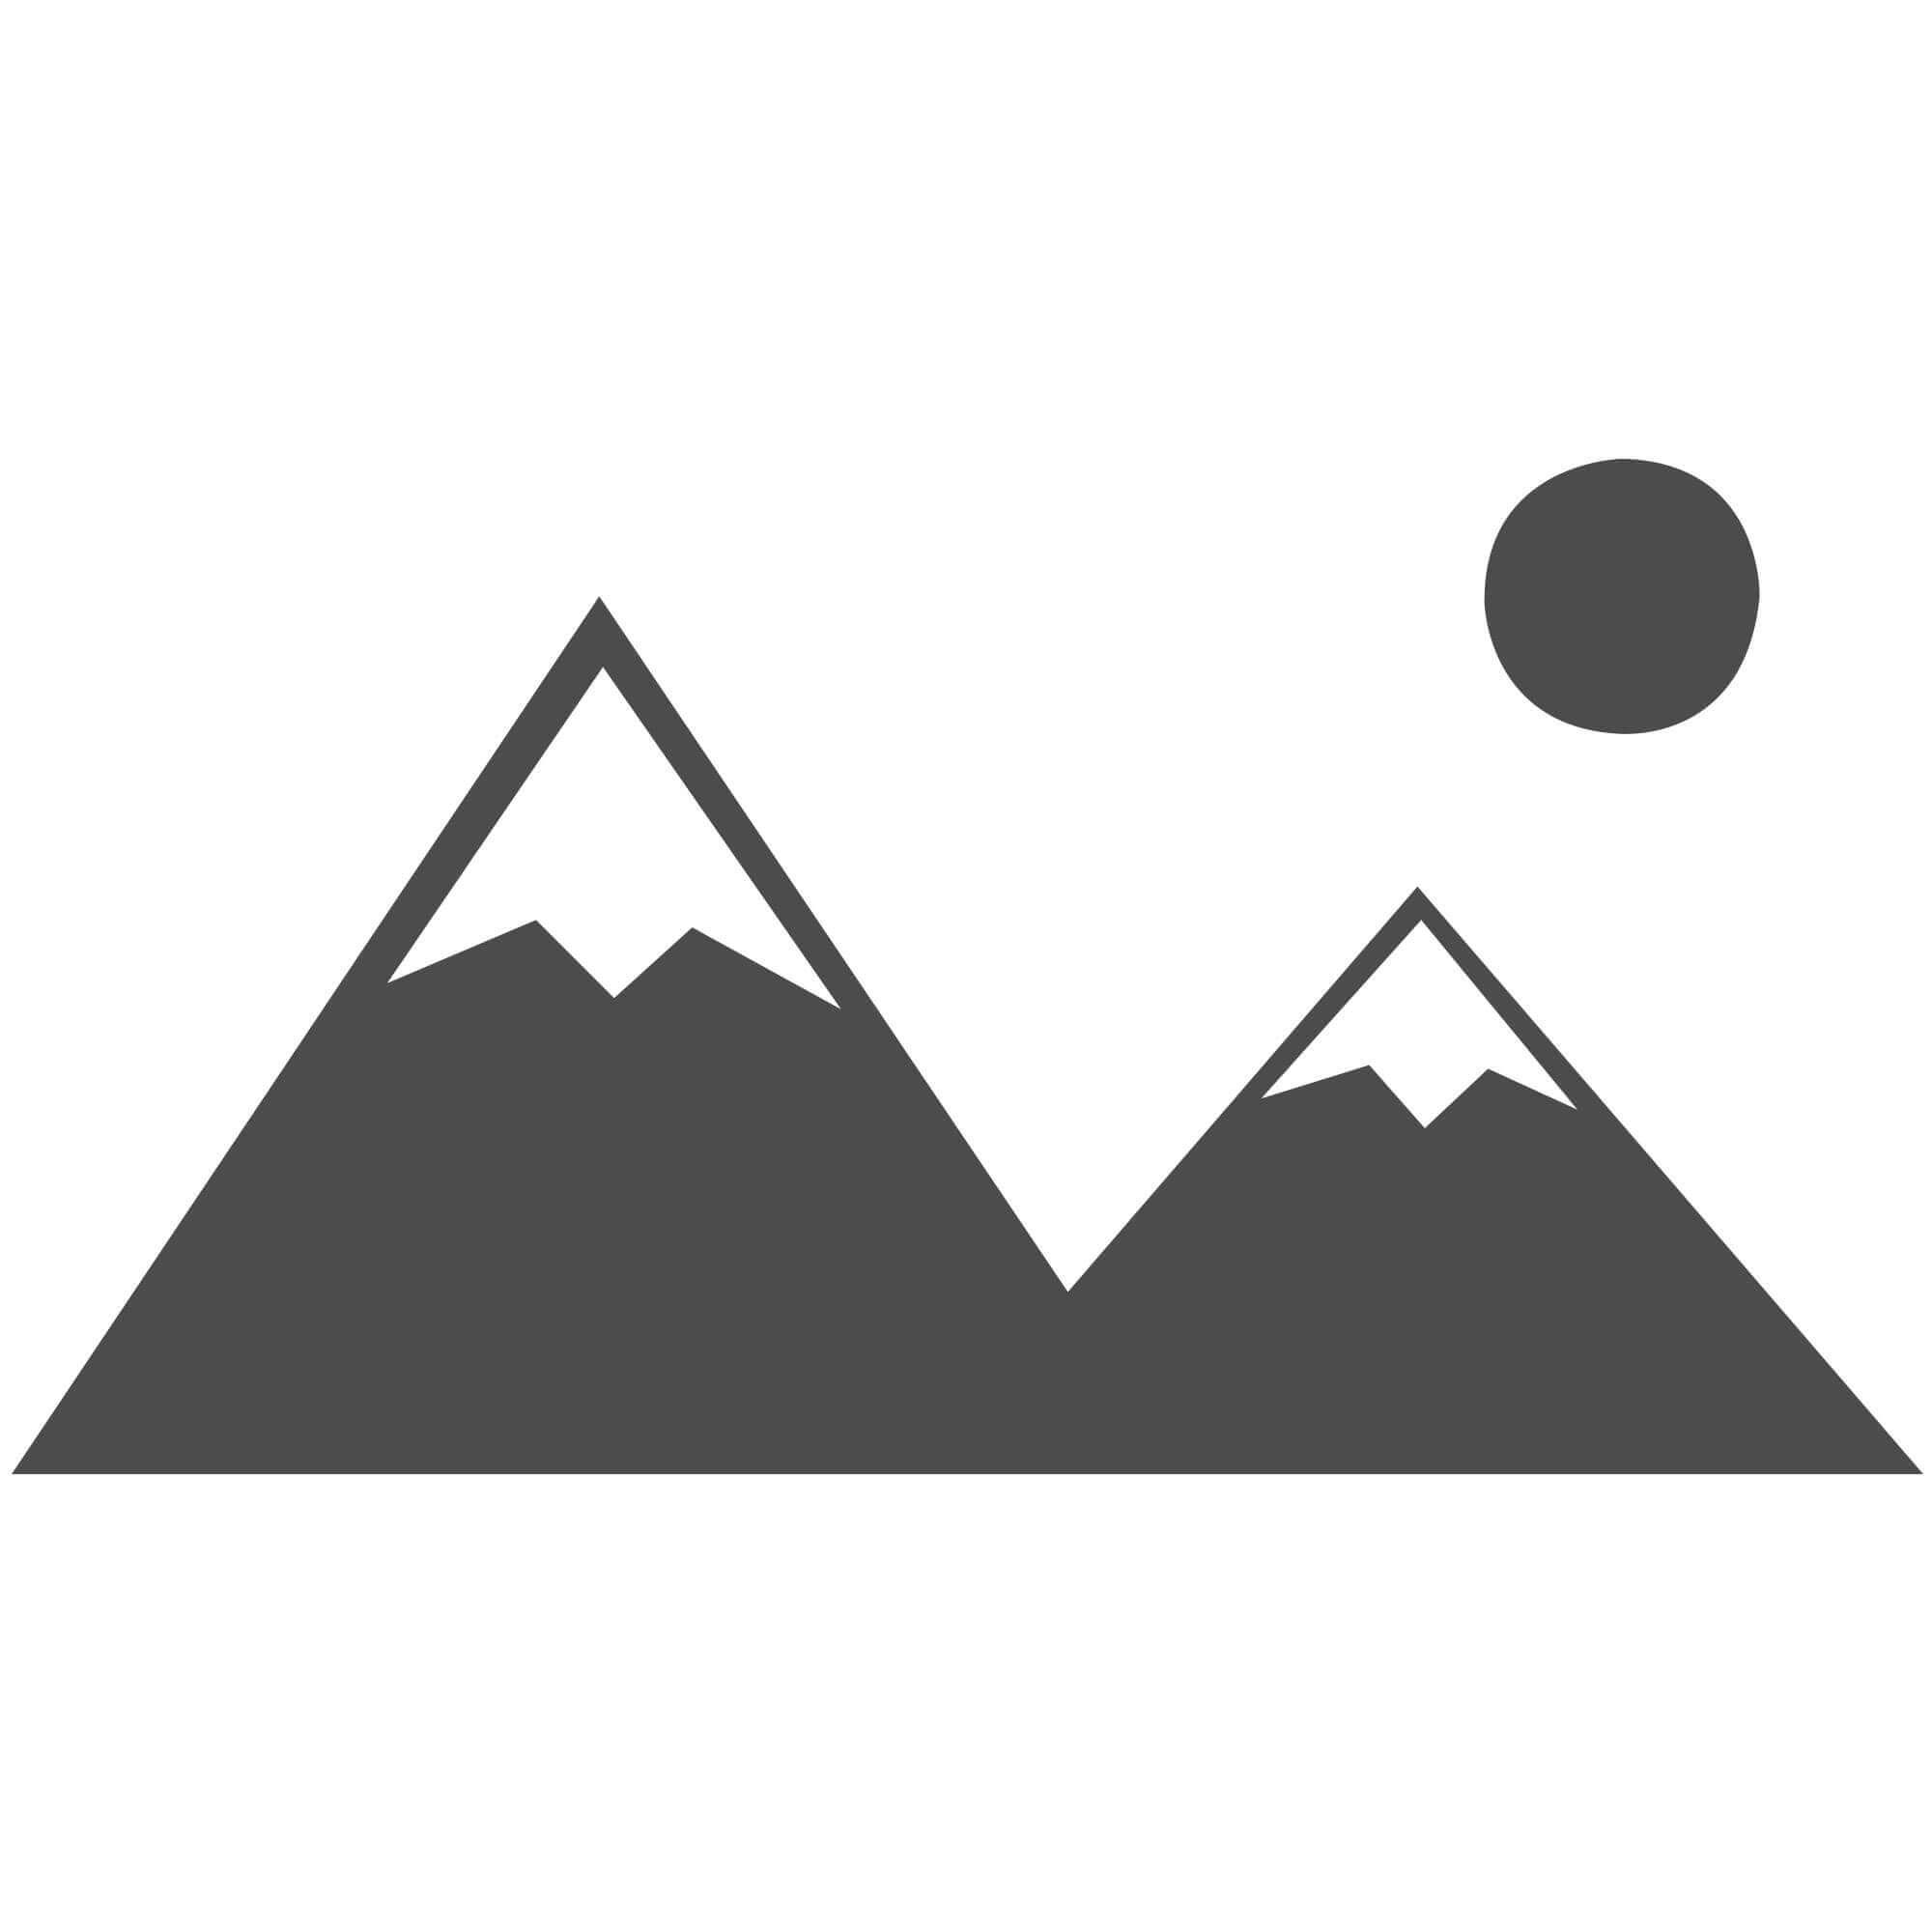 "Matrix Rug - 73 Palm Green - Size 120 x 170 cm (4' x 5'7"")"